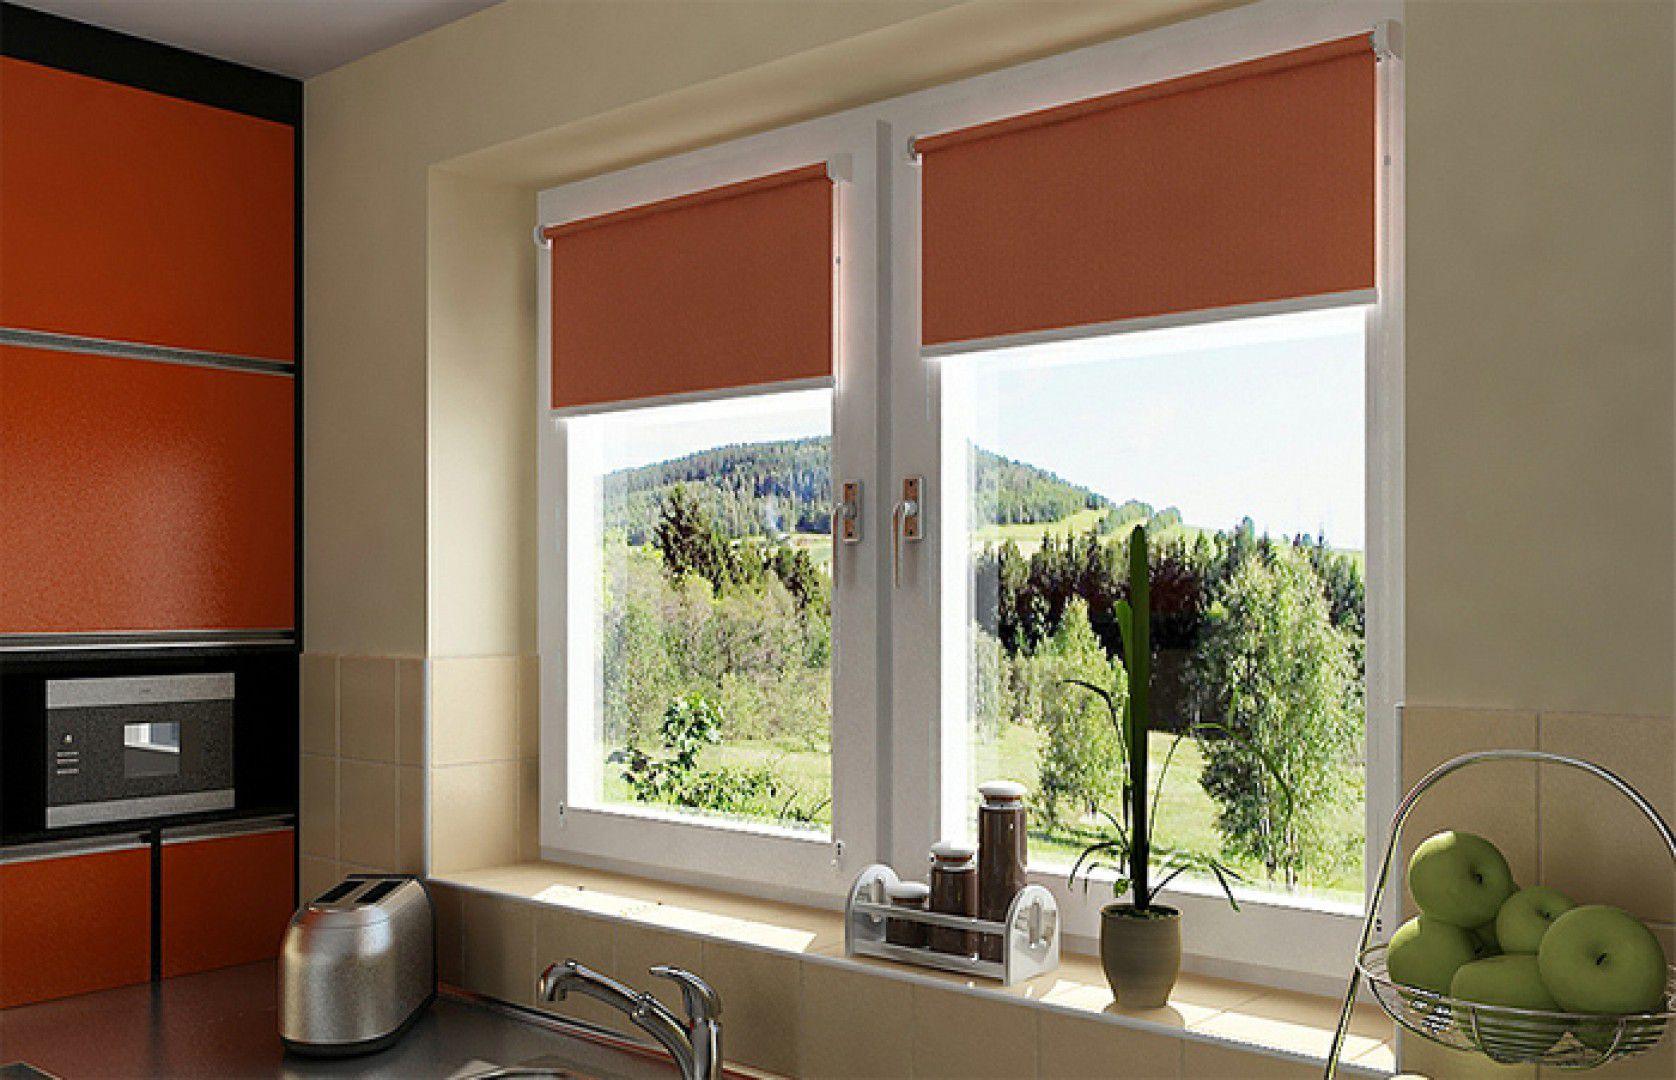 Как выбрать рулонные шторы для каждой комнаты?.